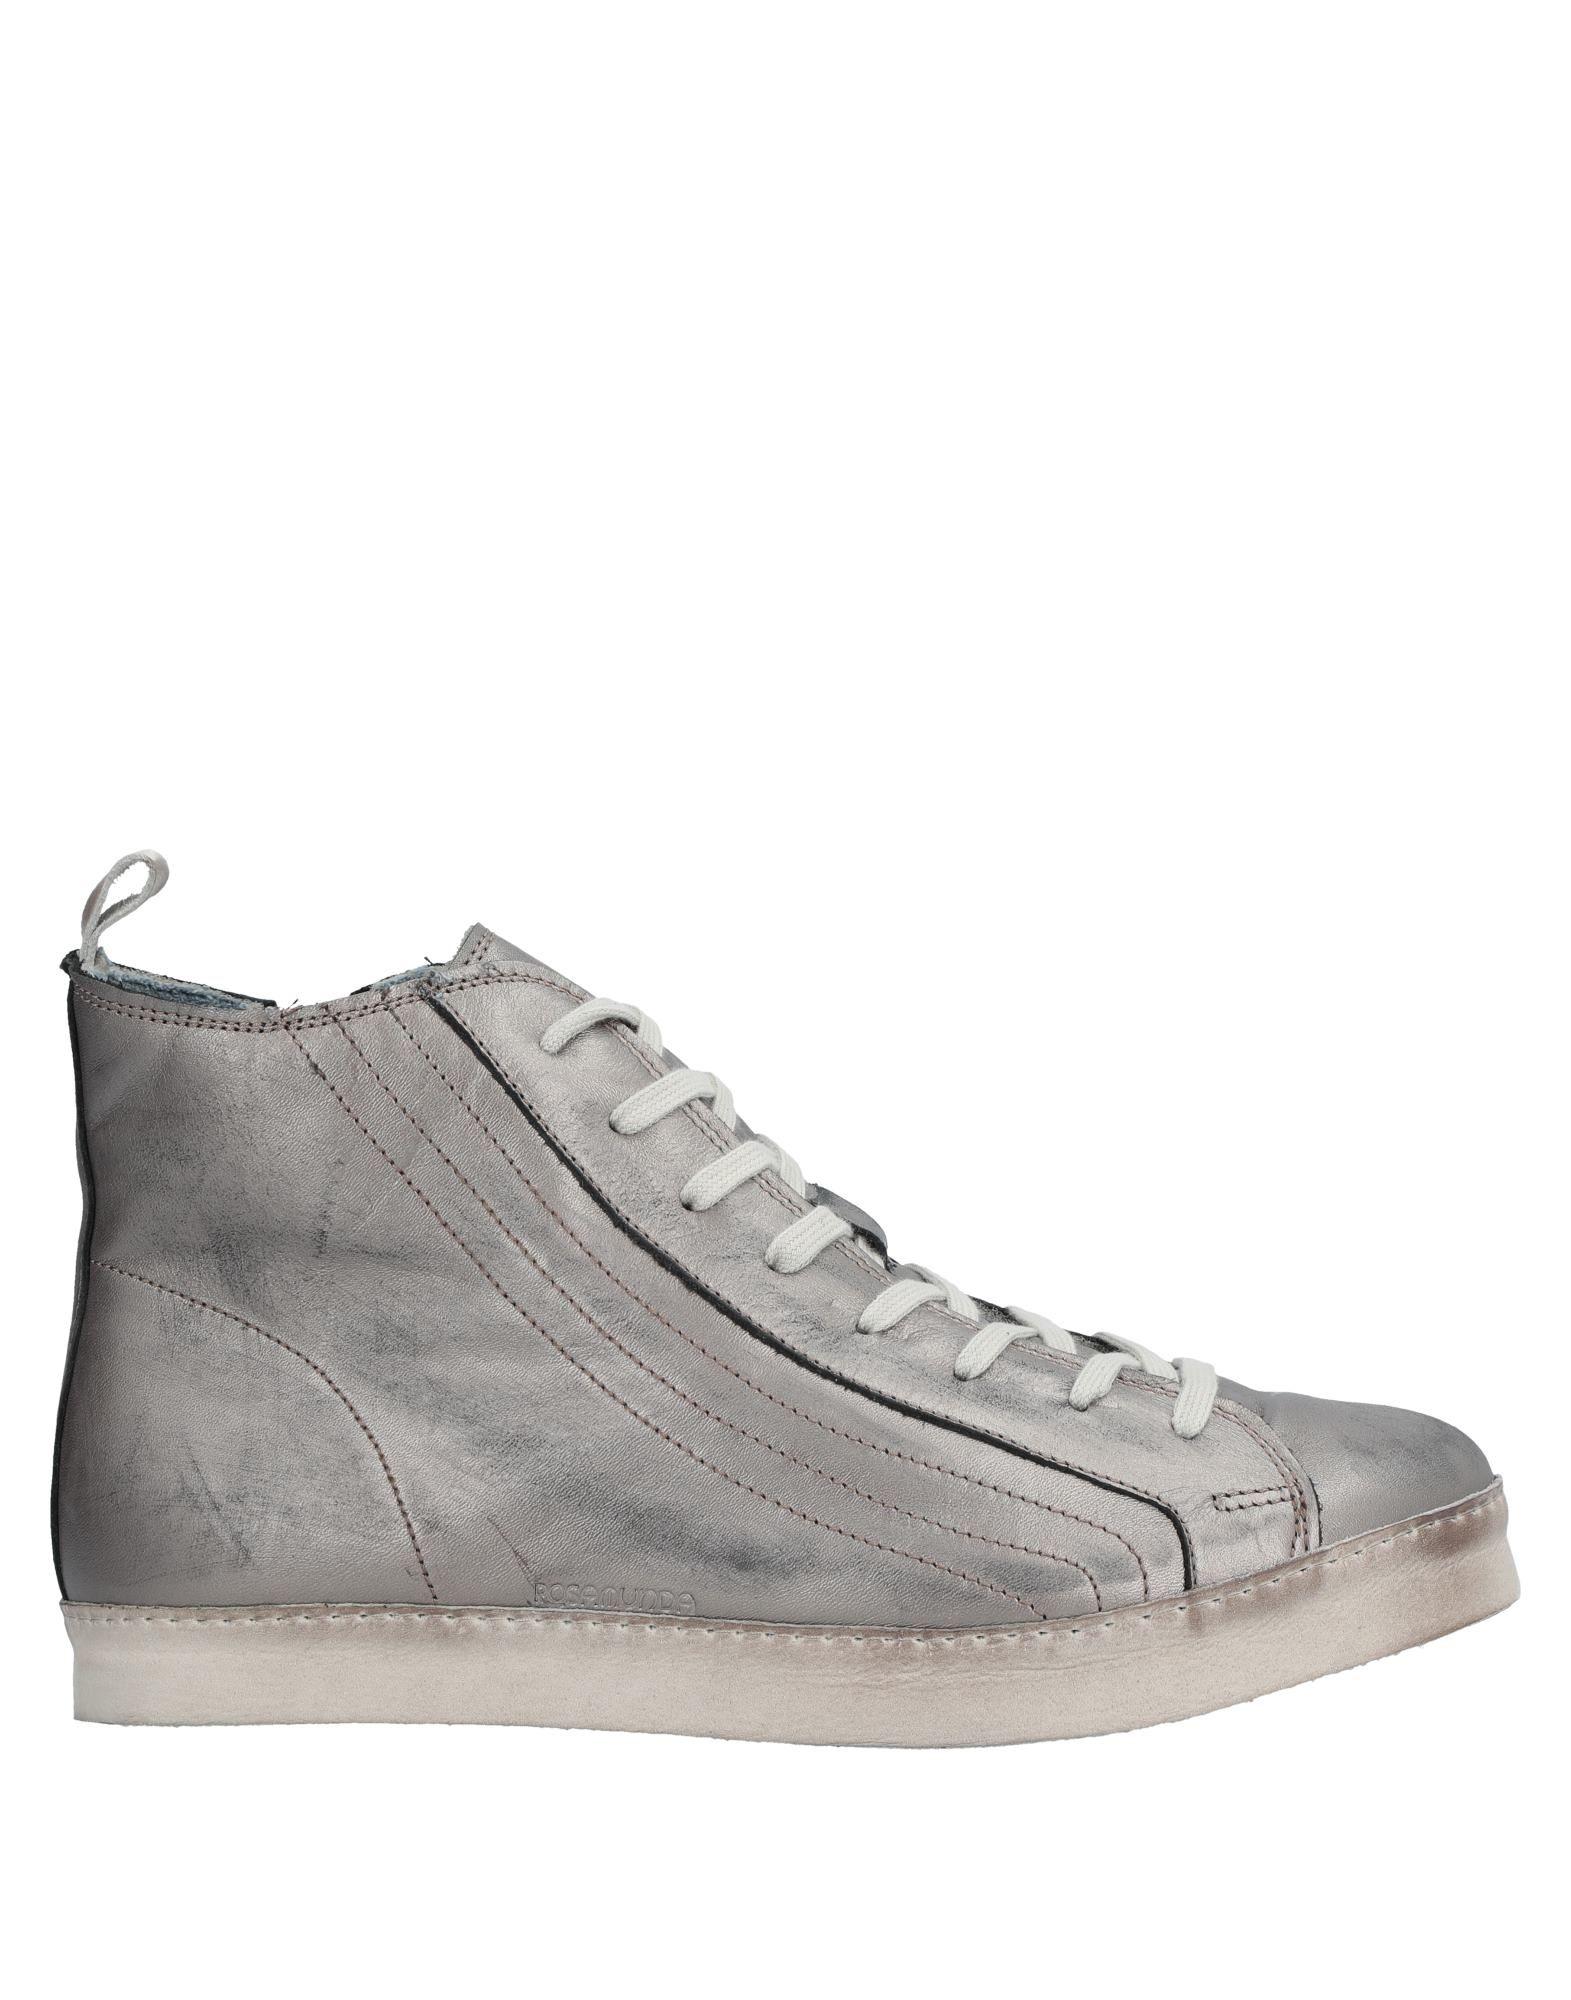 Rosamunda Sneakers - Women Rosamunda Rosamunda Rosamunda Sneakers online on  United Kingdom - 11538985VU 971f45